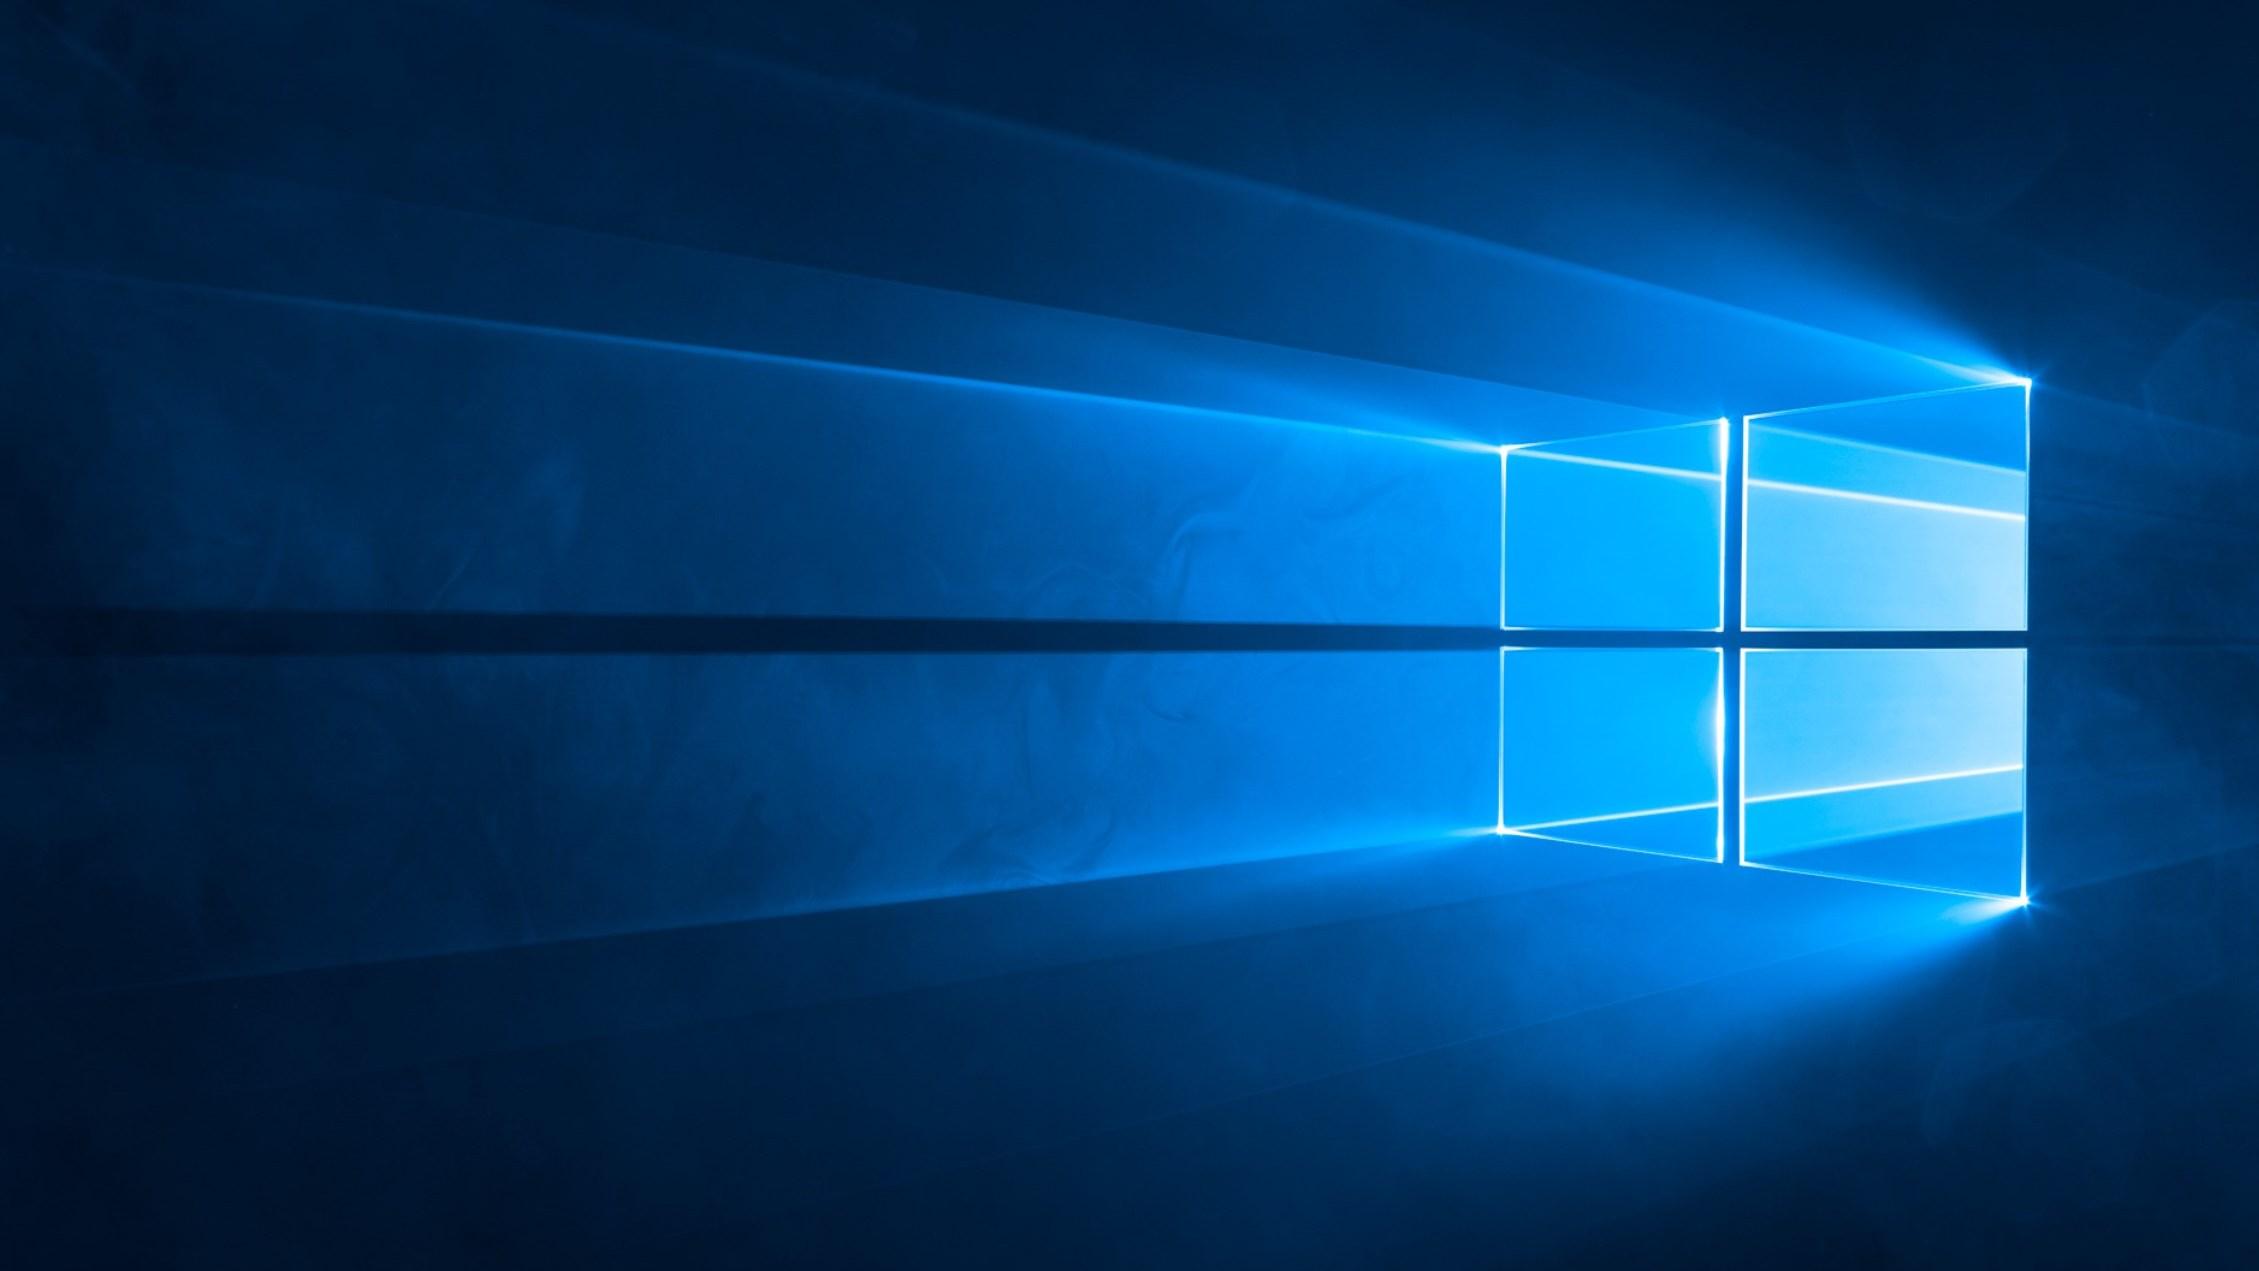 Windows 10 lock screen clipart location.